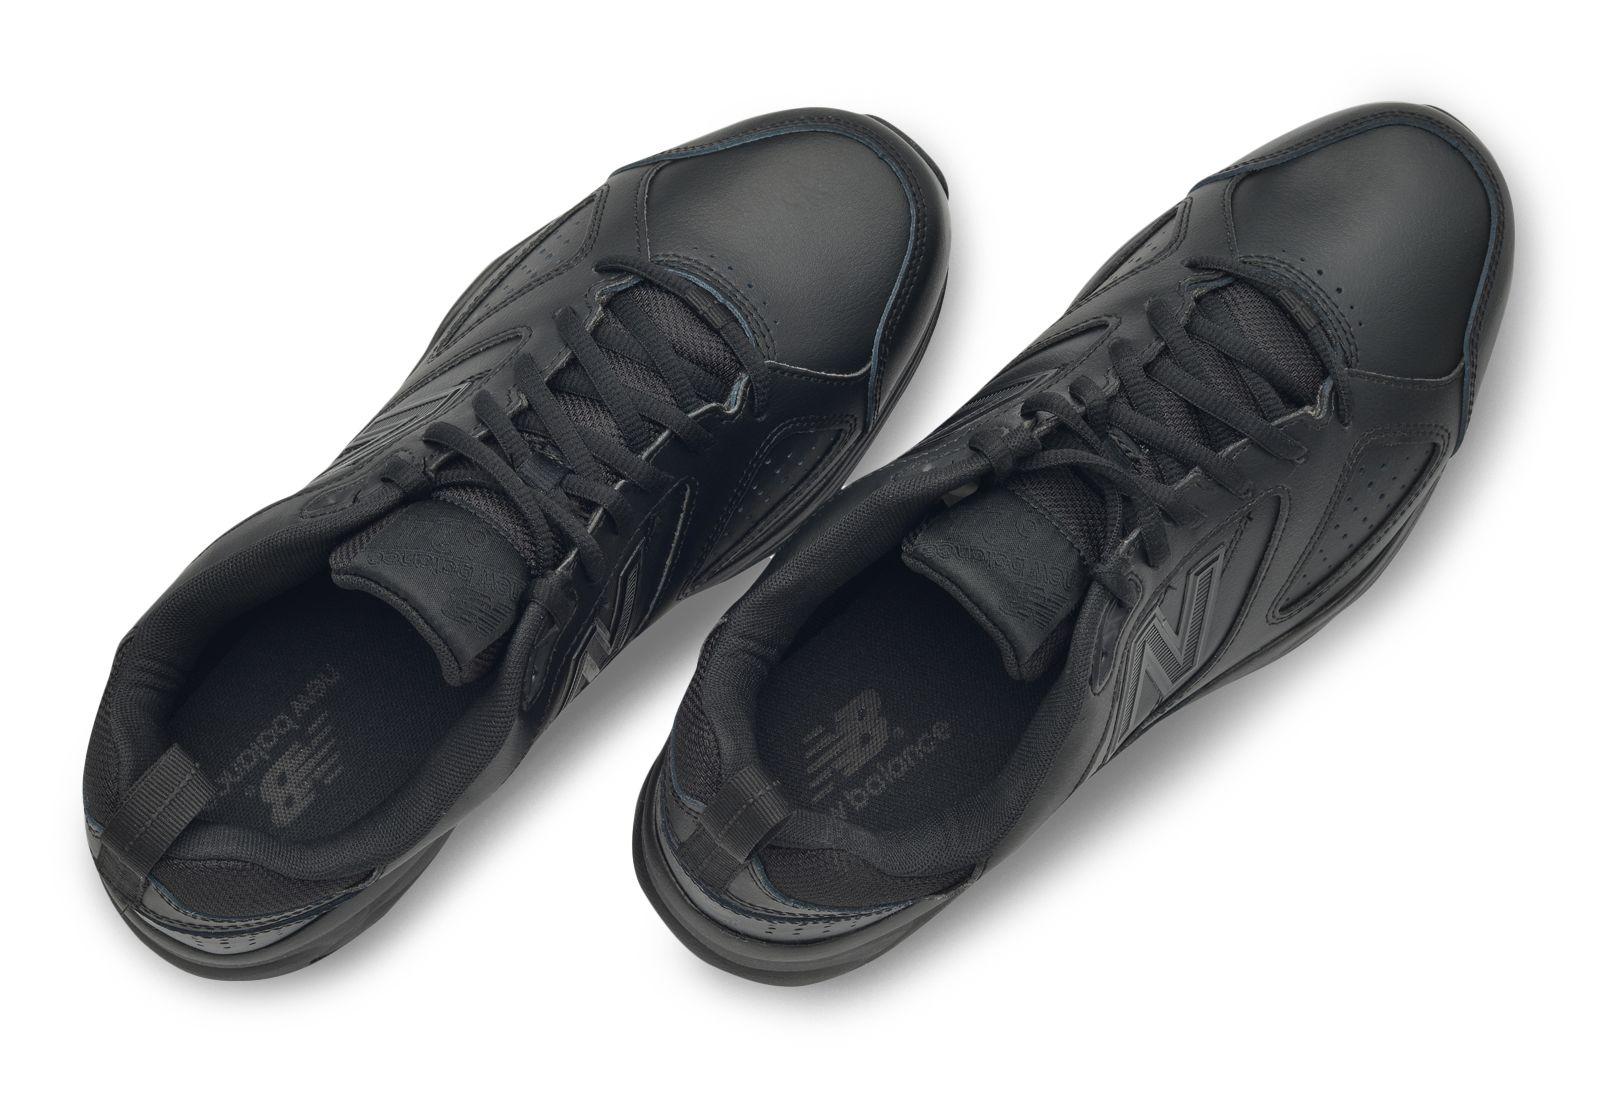 thumbnail 13 - New Balance 624v4 Leather Men's Running Running Training Shoes